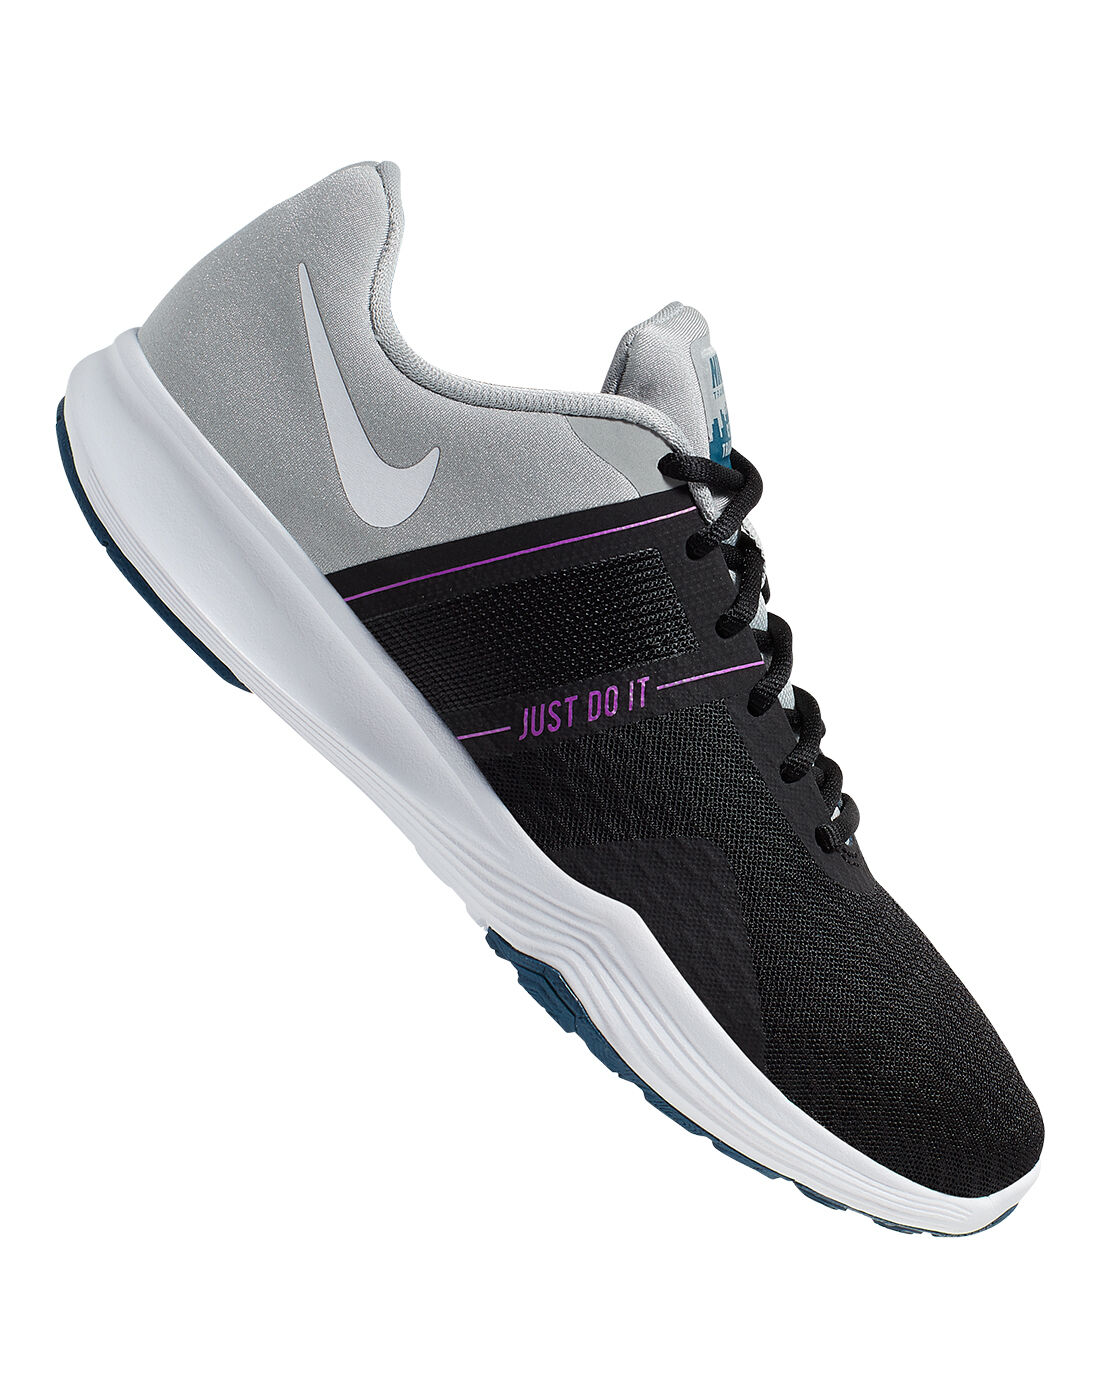 Nike Womens City Trainer 2 - Black